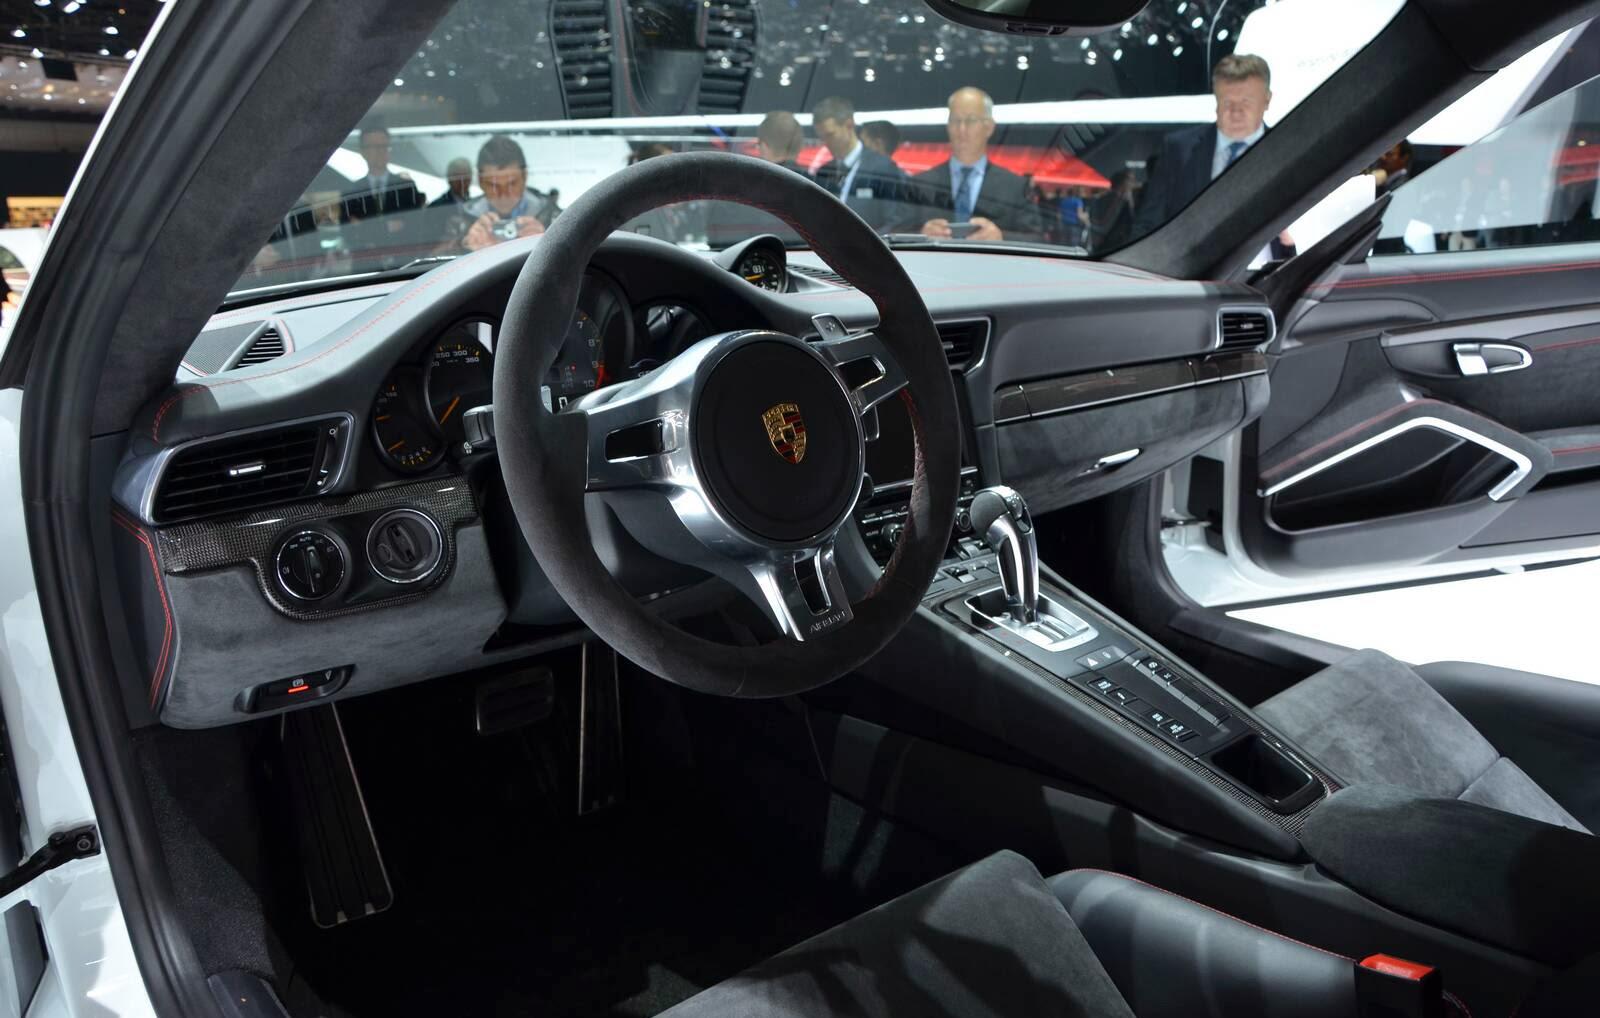 2015 porsche 911 gt2 fast speedy cars. Black Bedroom Furniture Sets. Home Design Ideas